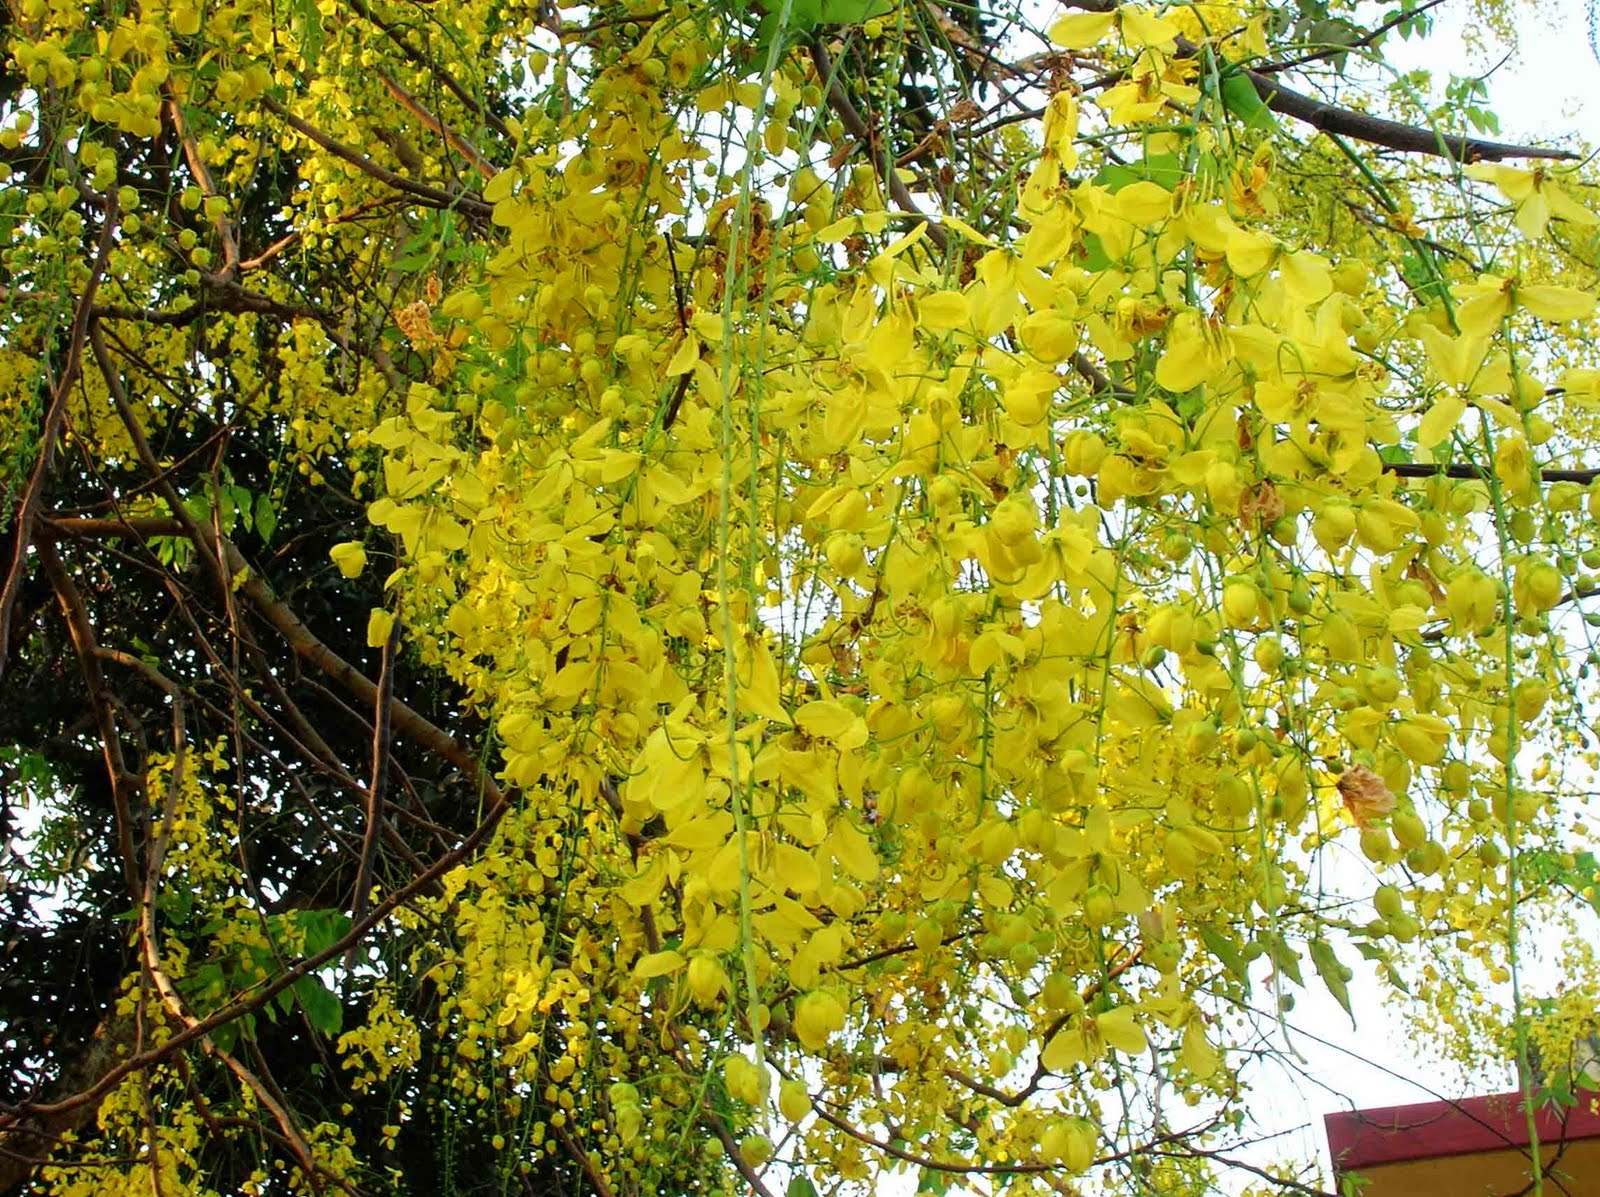 The urban gardener summer sherbet mumbai 39 s flowering trees - Trees that bloom yellow flowers ...